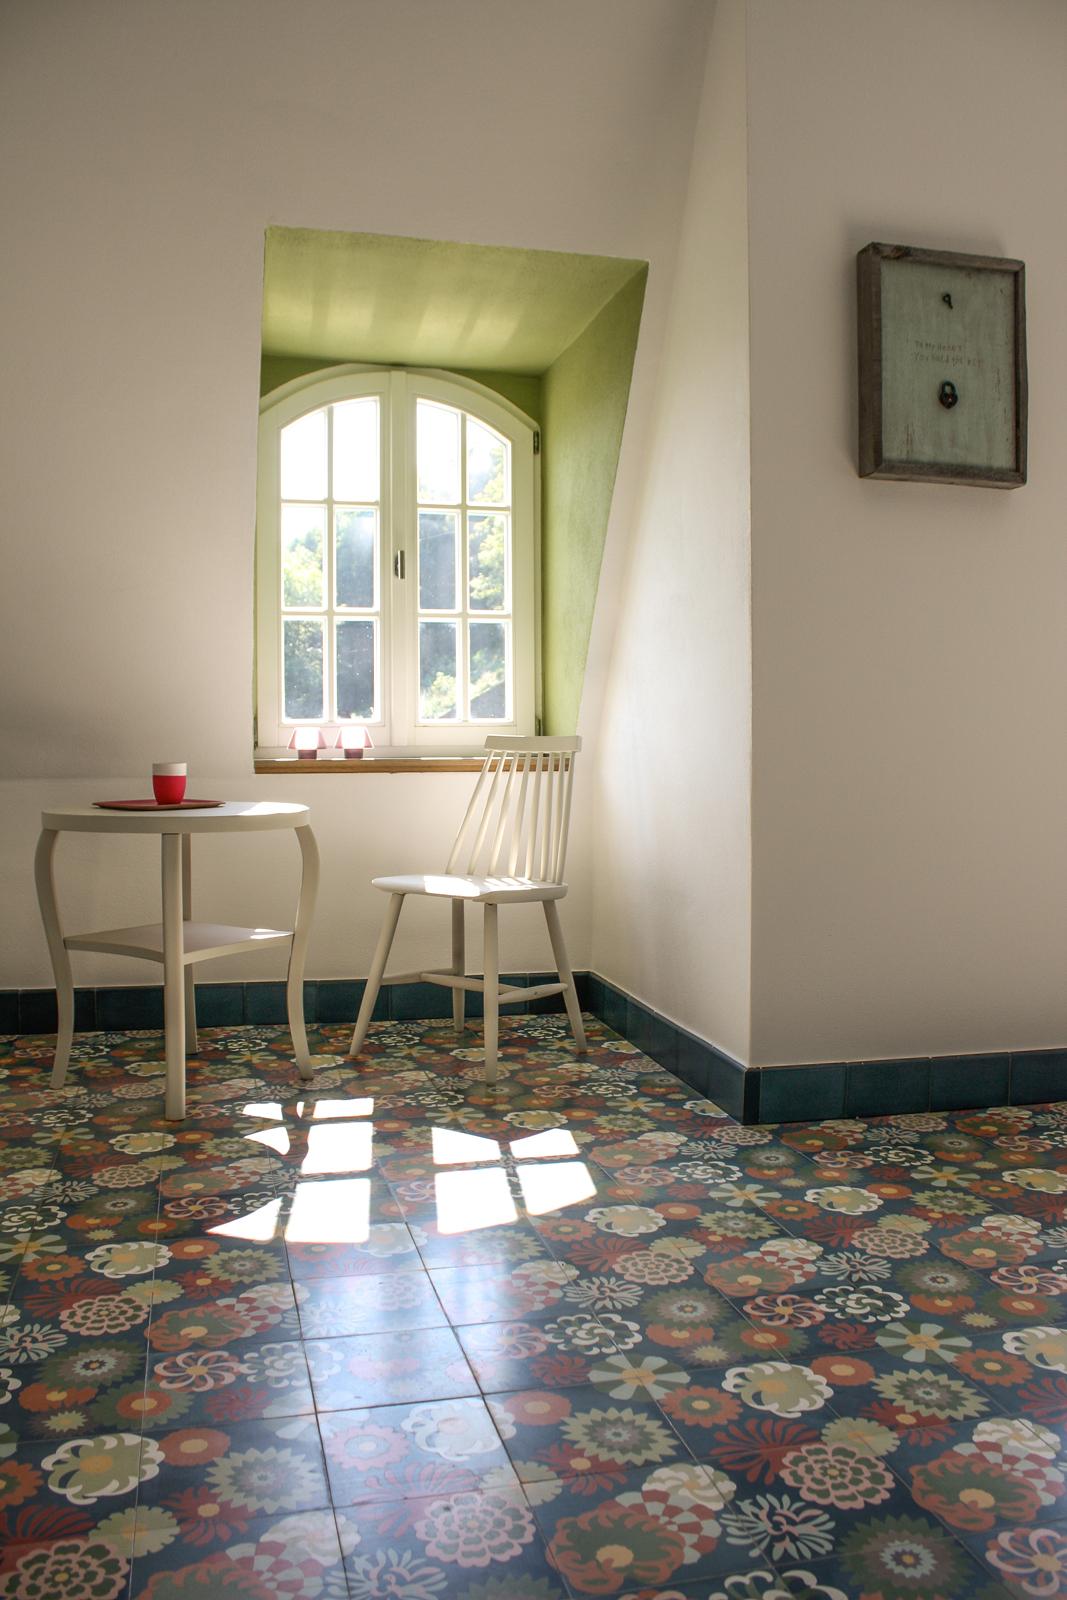 kreidefarbe-Edelweiss-111-tisch-stuhl-zementfliesen-terrazzofliesen-viaplatten | Kreidefarbe Edelweiß 2500 ml